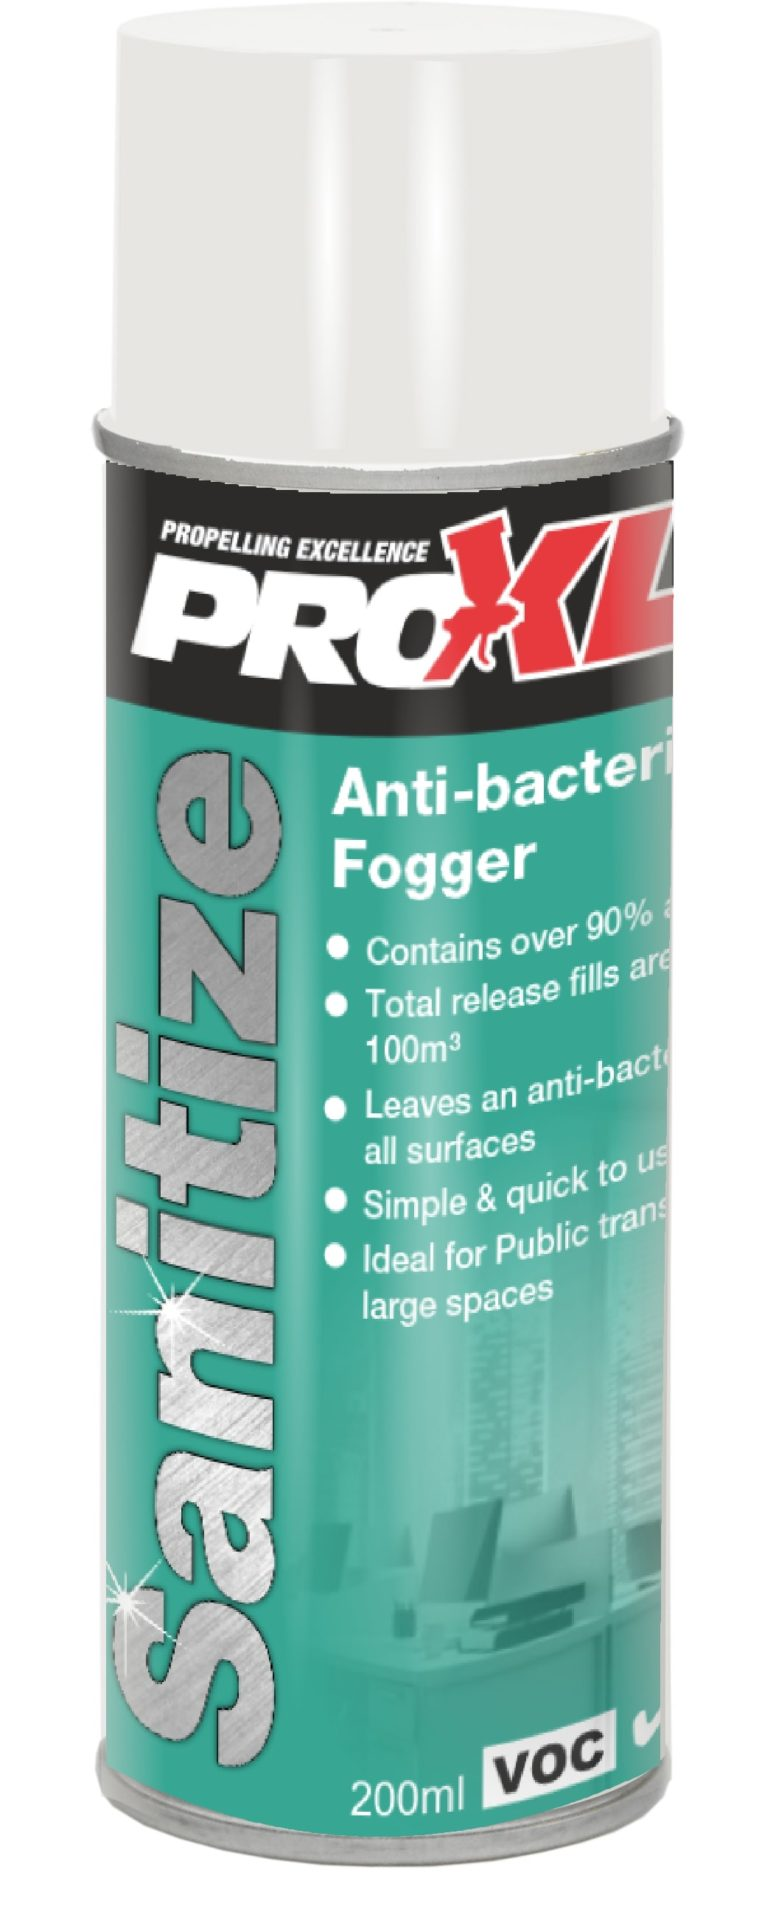 Anti-Bacterial Room Fogger Aerosol (200ml) Product Image